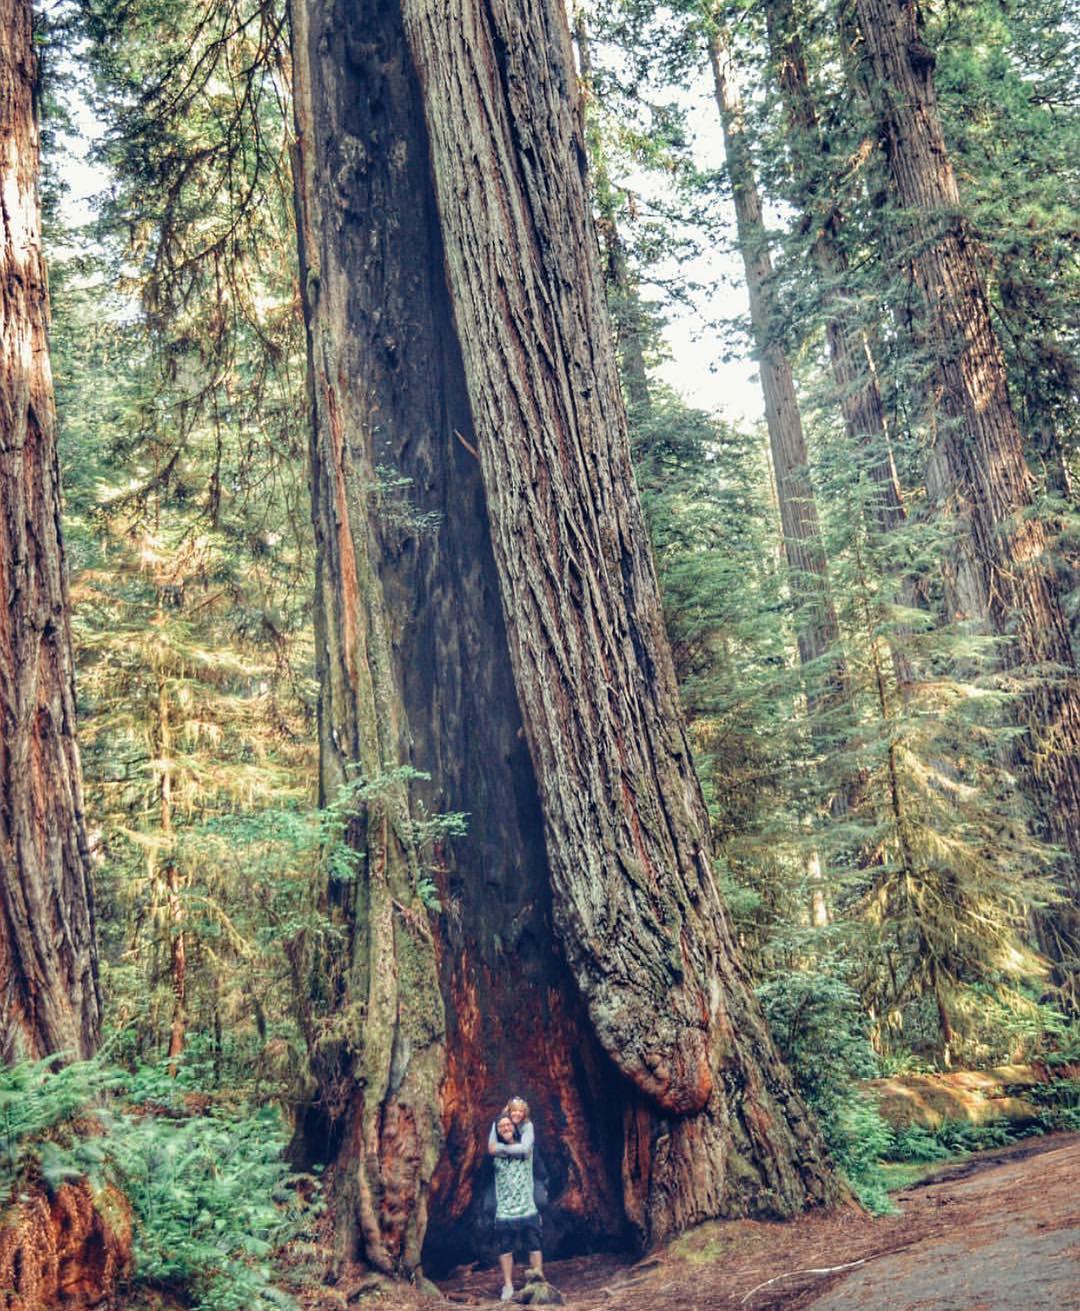 SheJumps ambassador @jazzfitz exploring the California Redwoods on her road trip. #iamsj #SheJumps #redwoods #california #trees #explore #getoutthere #getoutside #optoutside